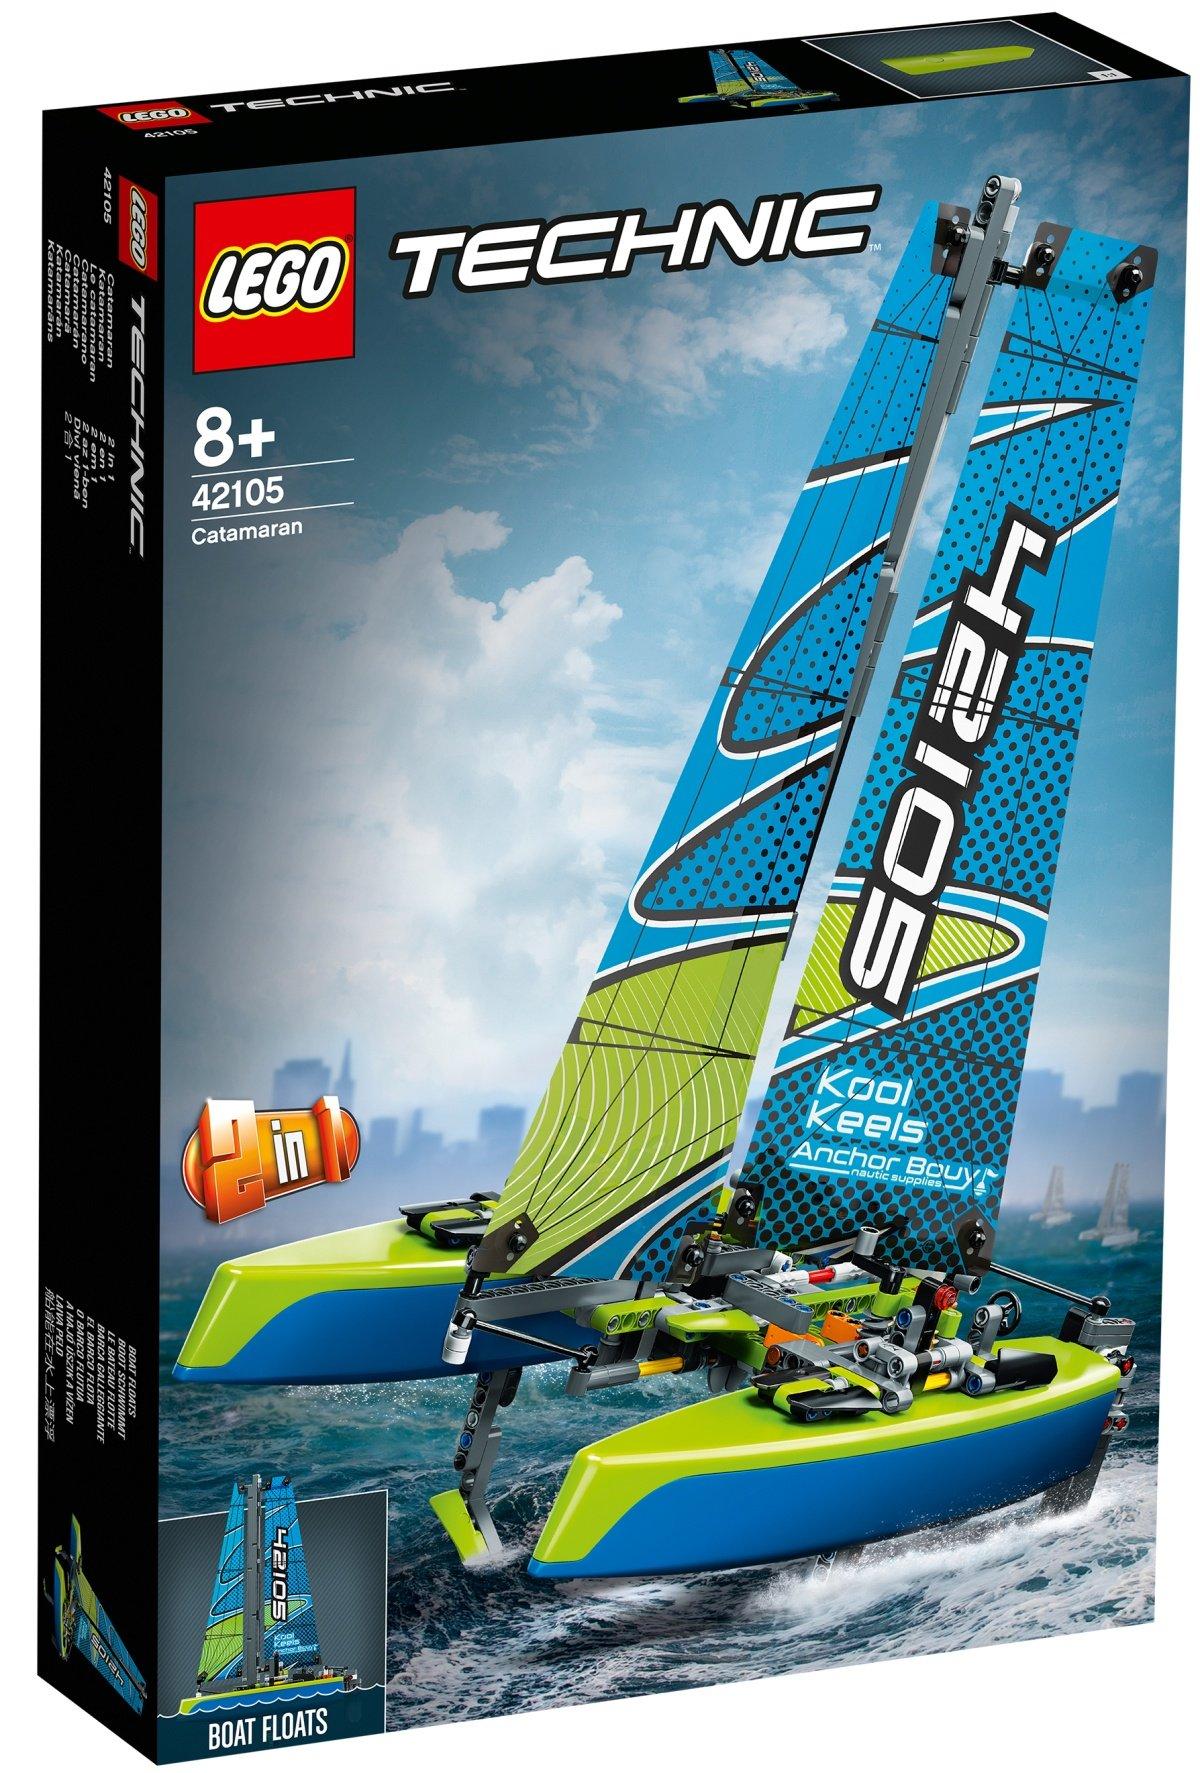 42105-lego-technic-catamaran-box-2020 zusammengebaut.com